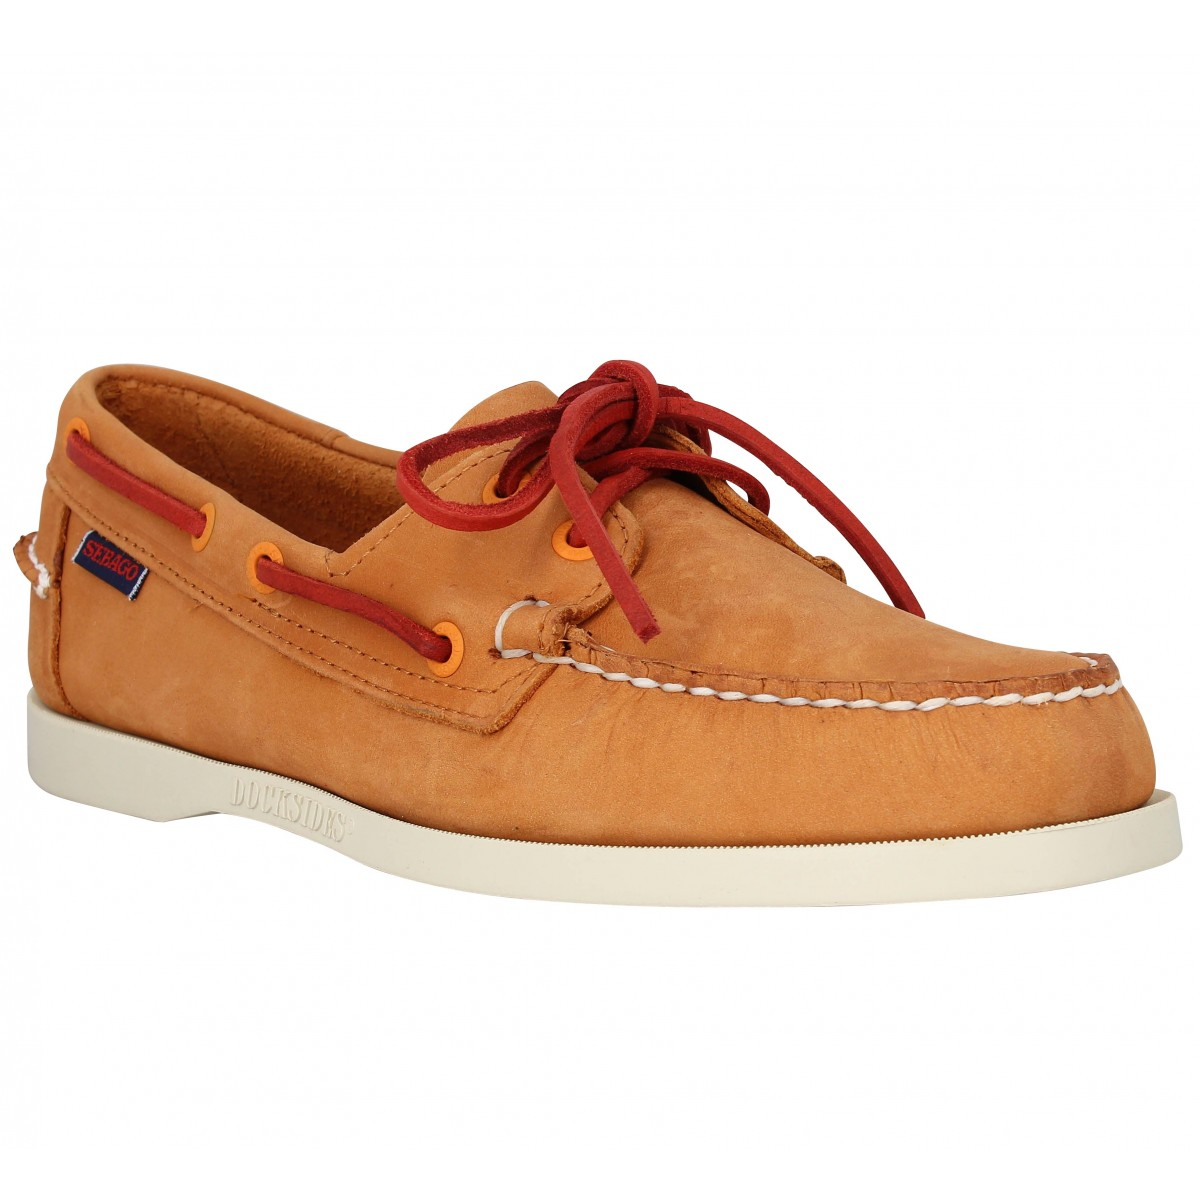 Chaussures bateaux SEBAGO Docksides velours Orange